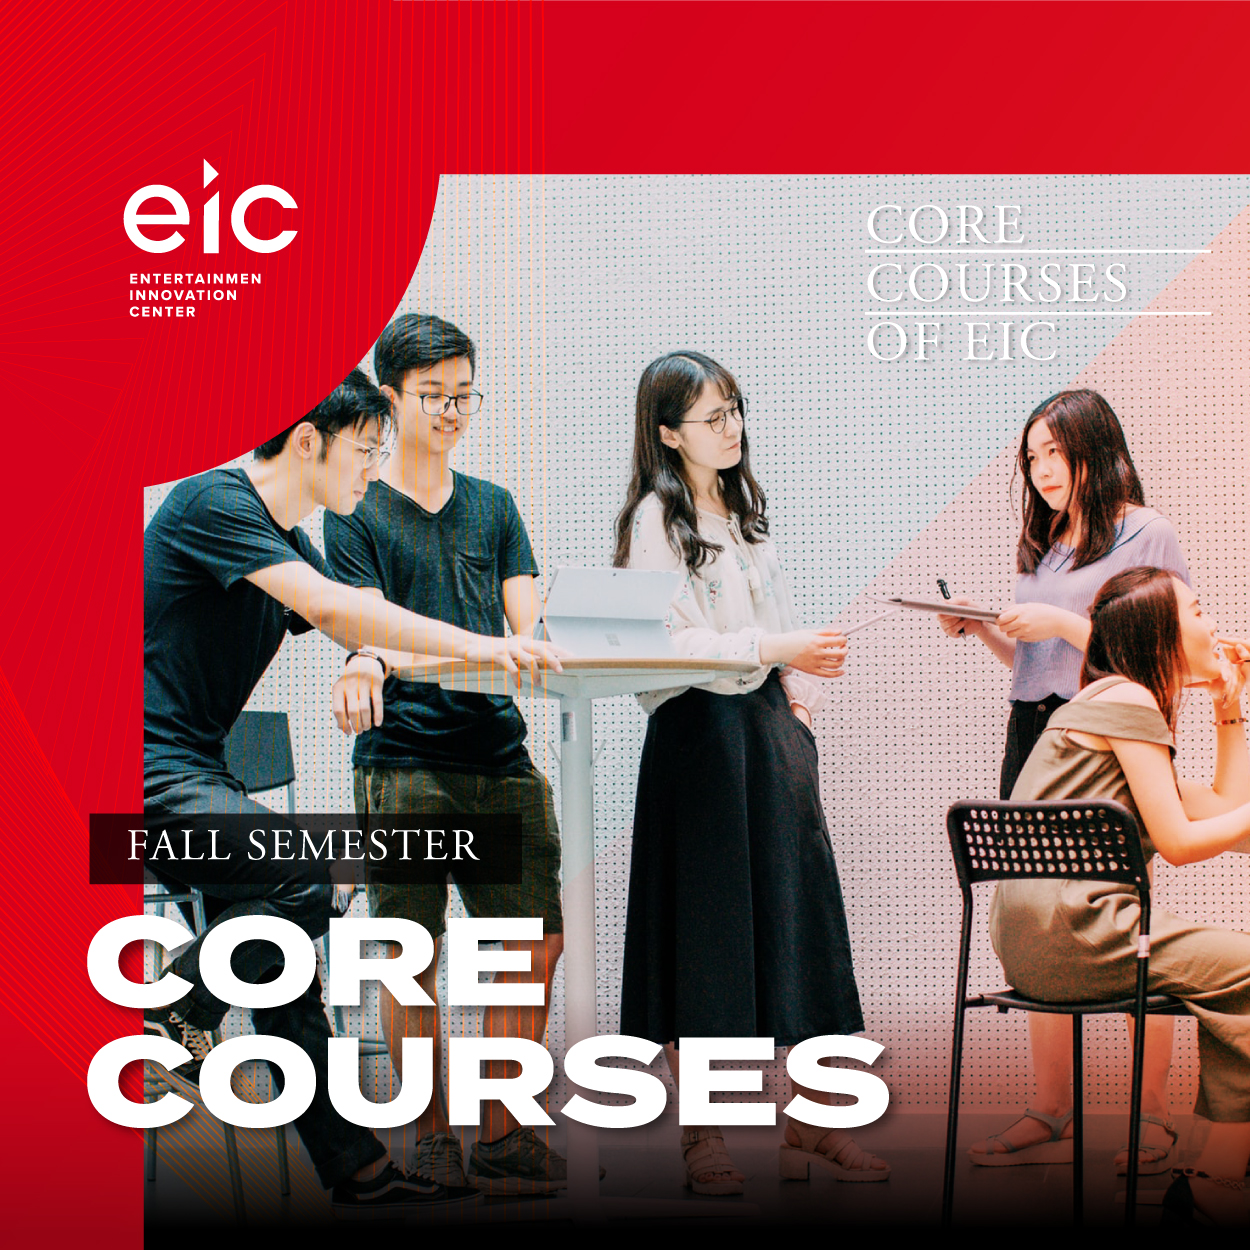 Core Courses วิชาหลัก ปูพื้นฐานใน Fall Semester